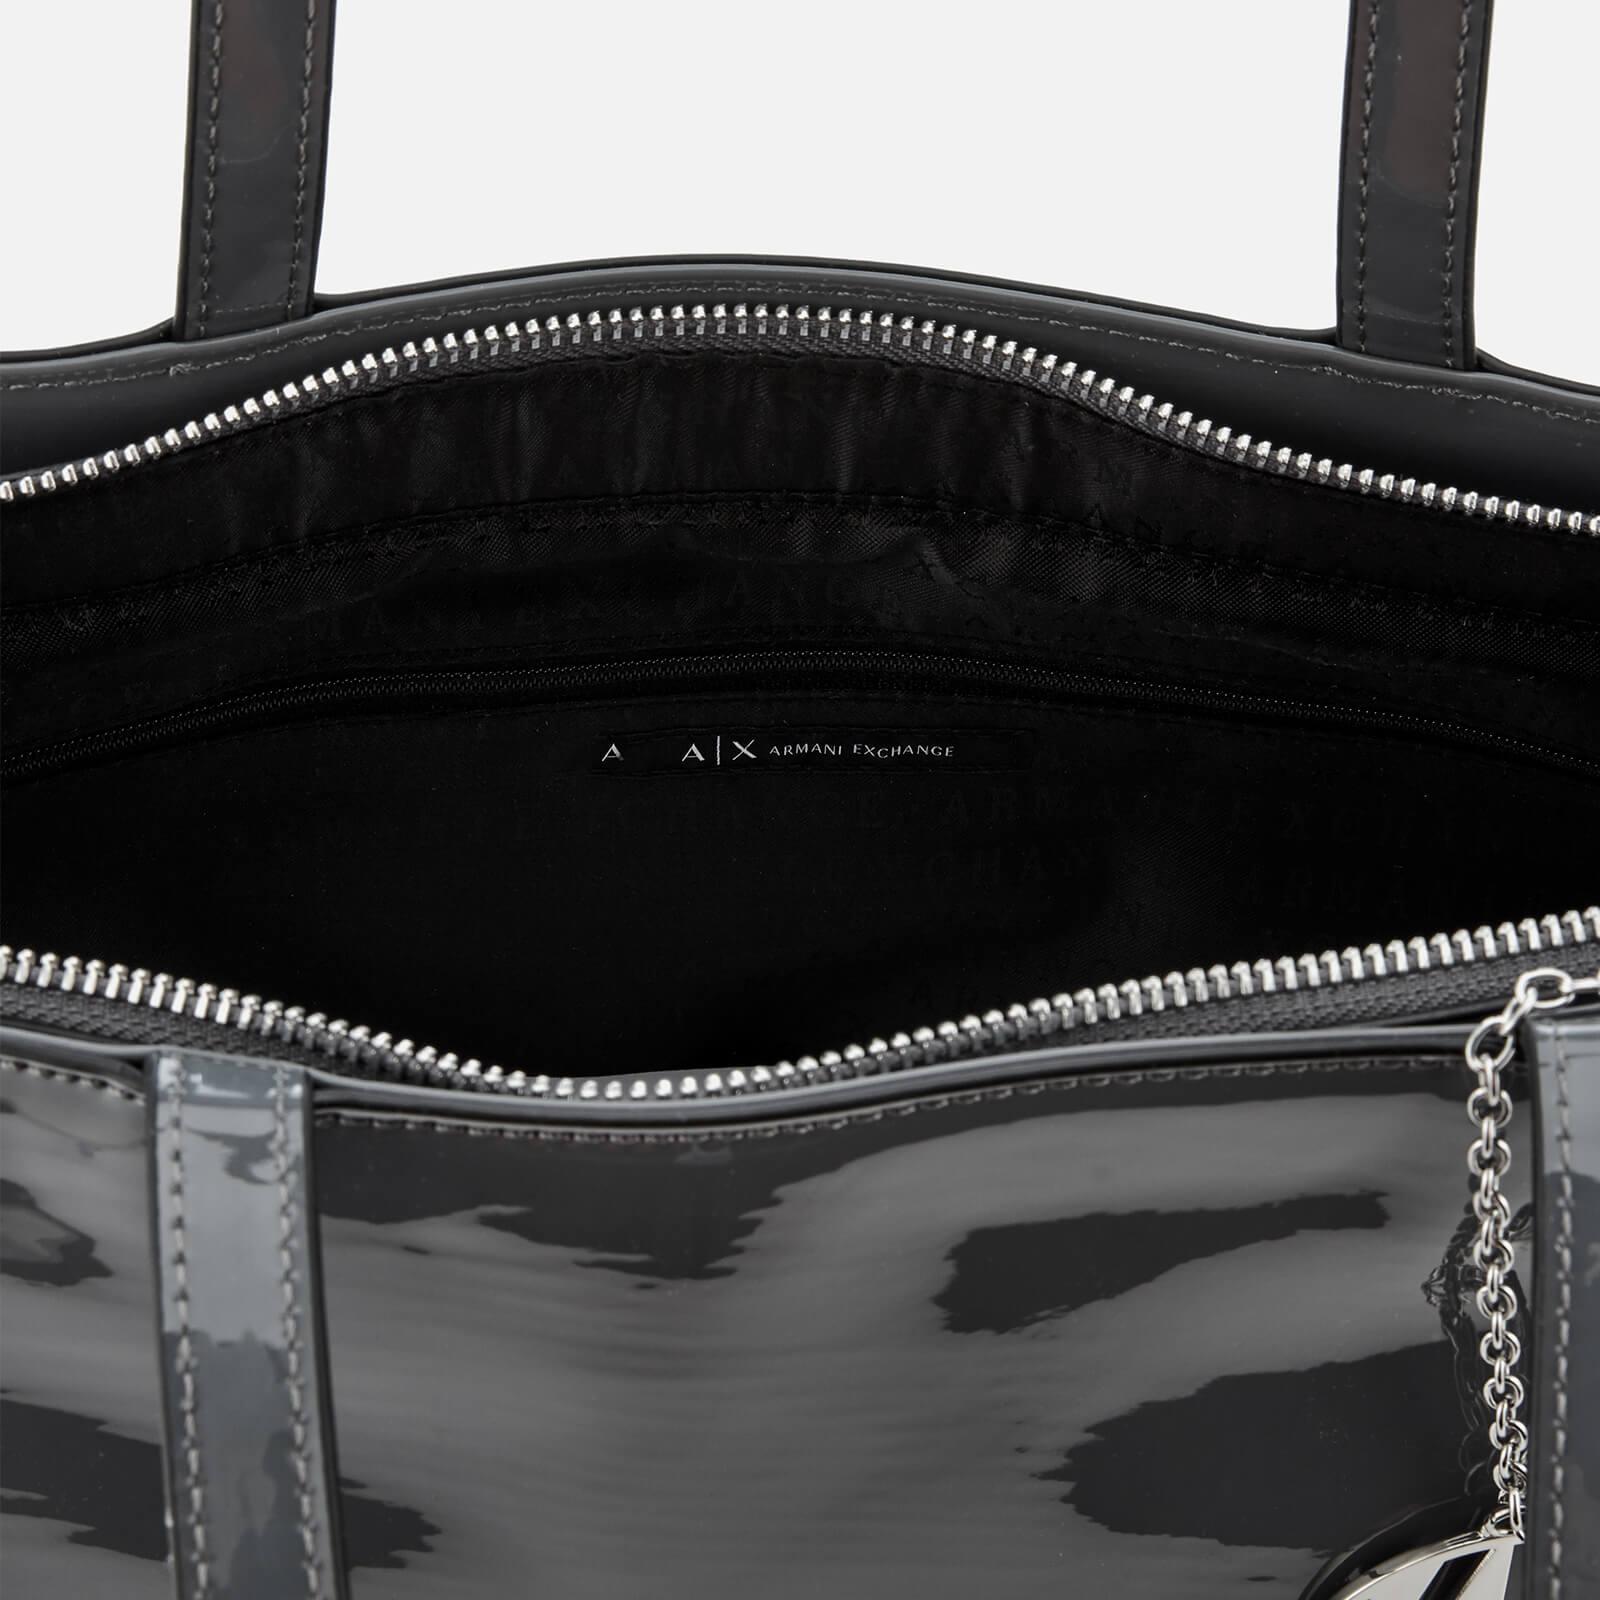 3f53d8c55d3 Armani Exchange - Black Patent Logo Tote Bag - Lyst. View fullscreen